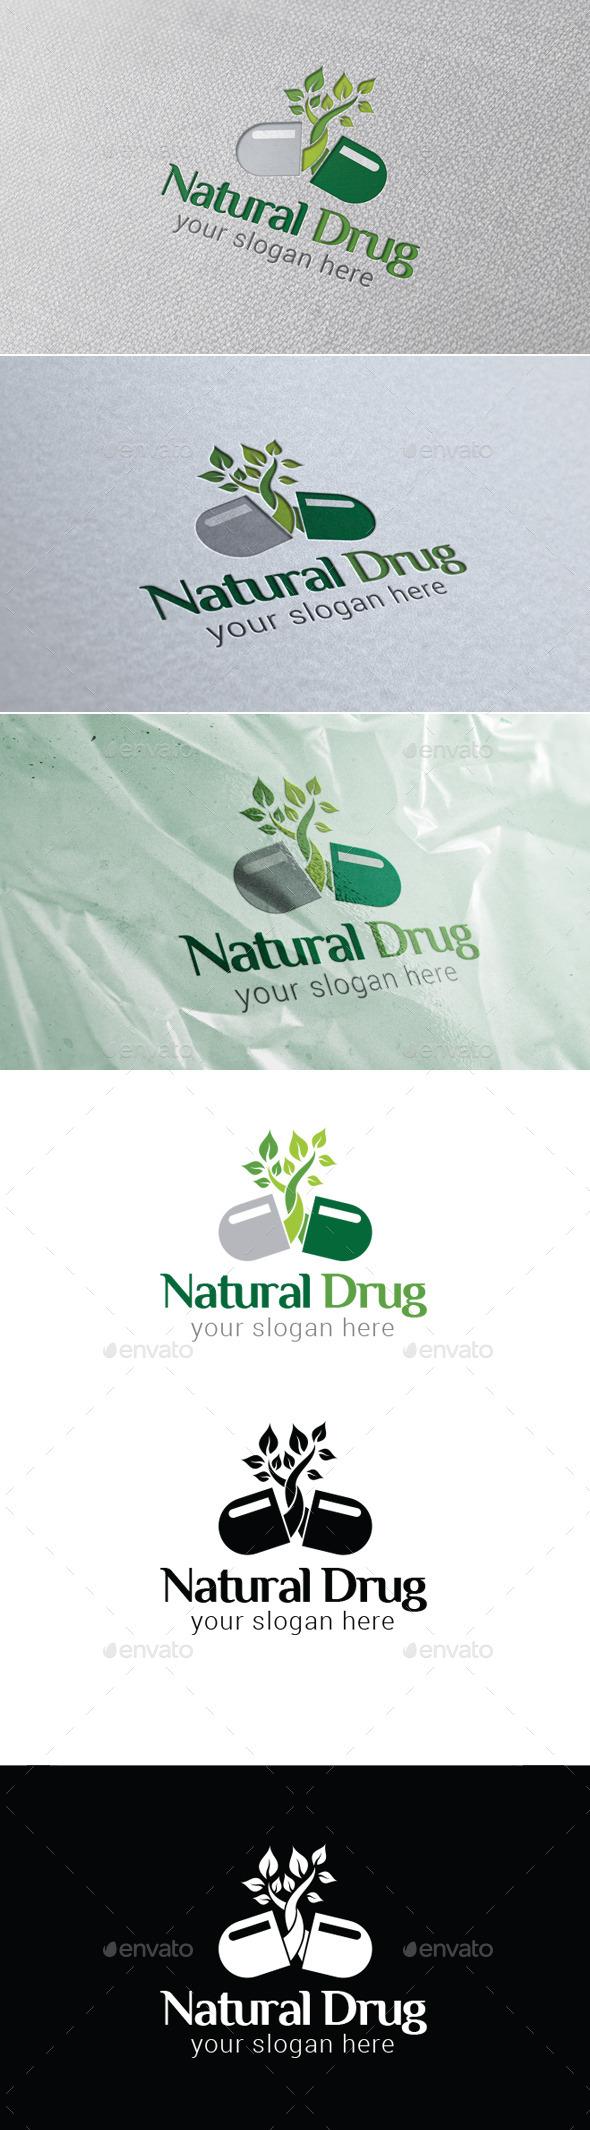 Natural Drug Logo Template - Nature Logo Templates